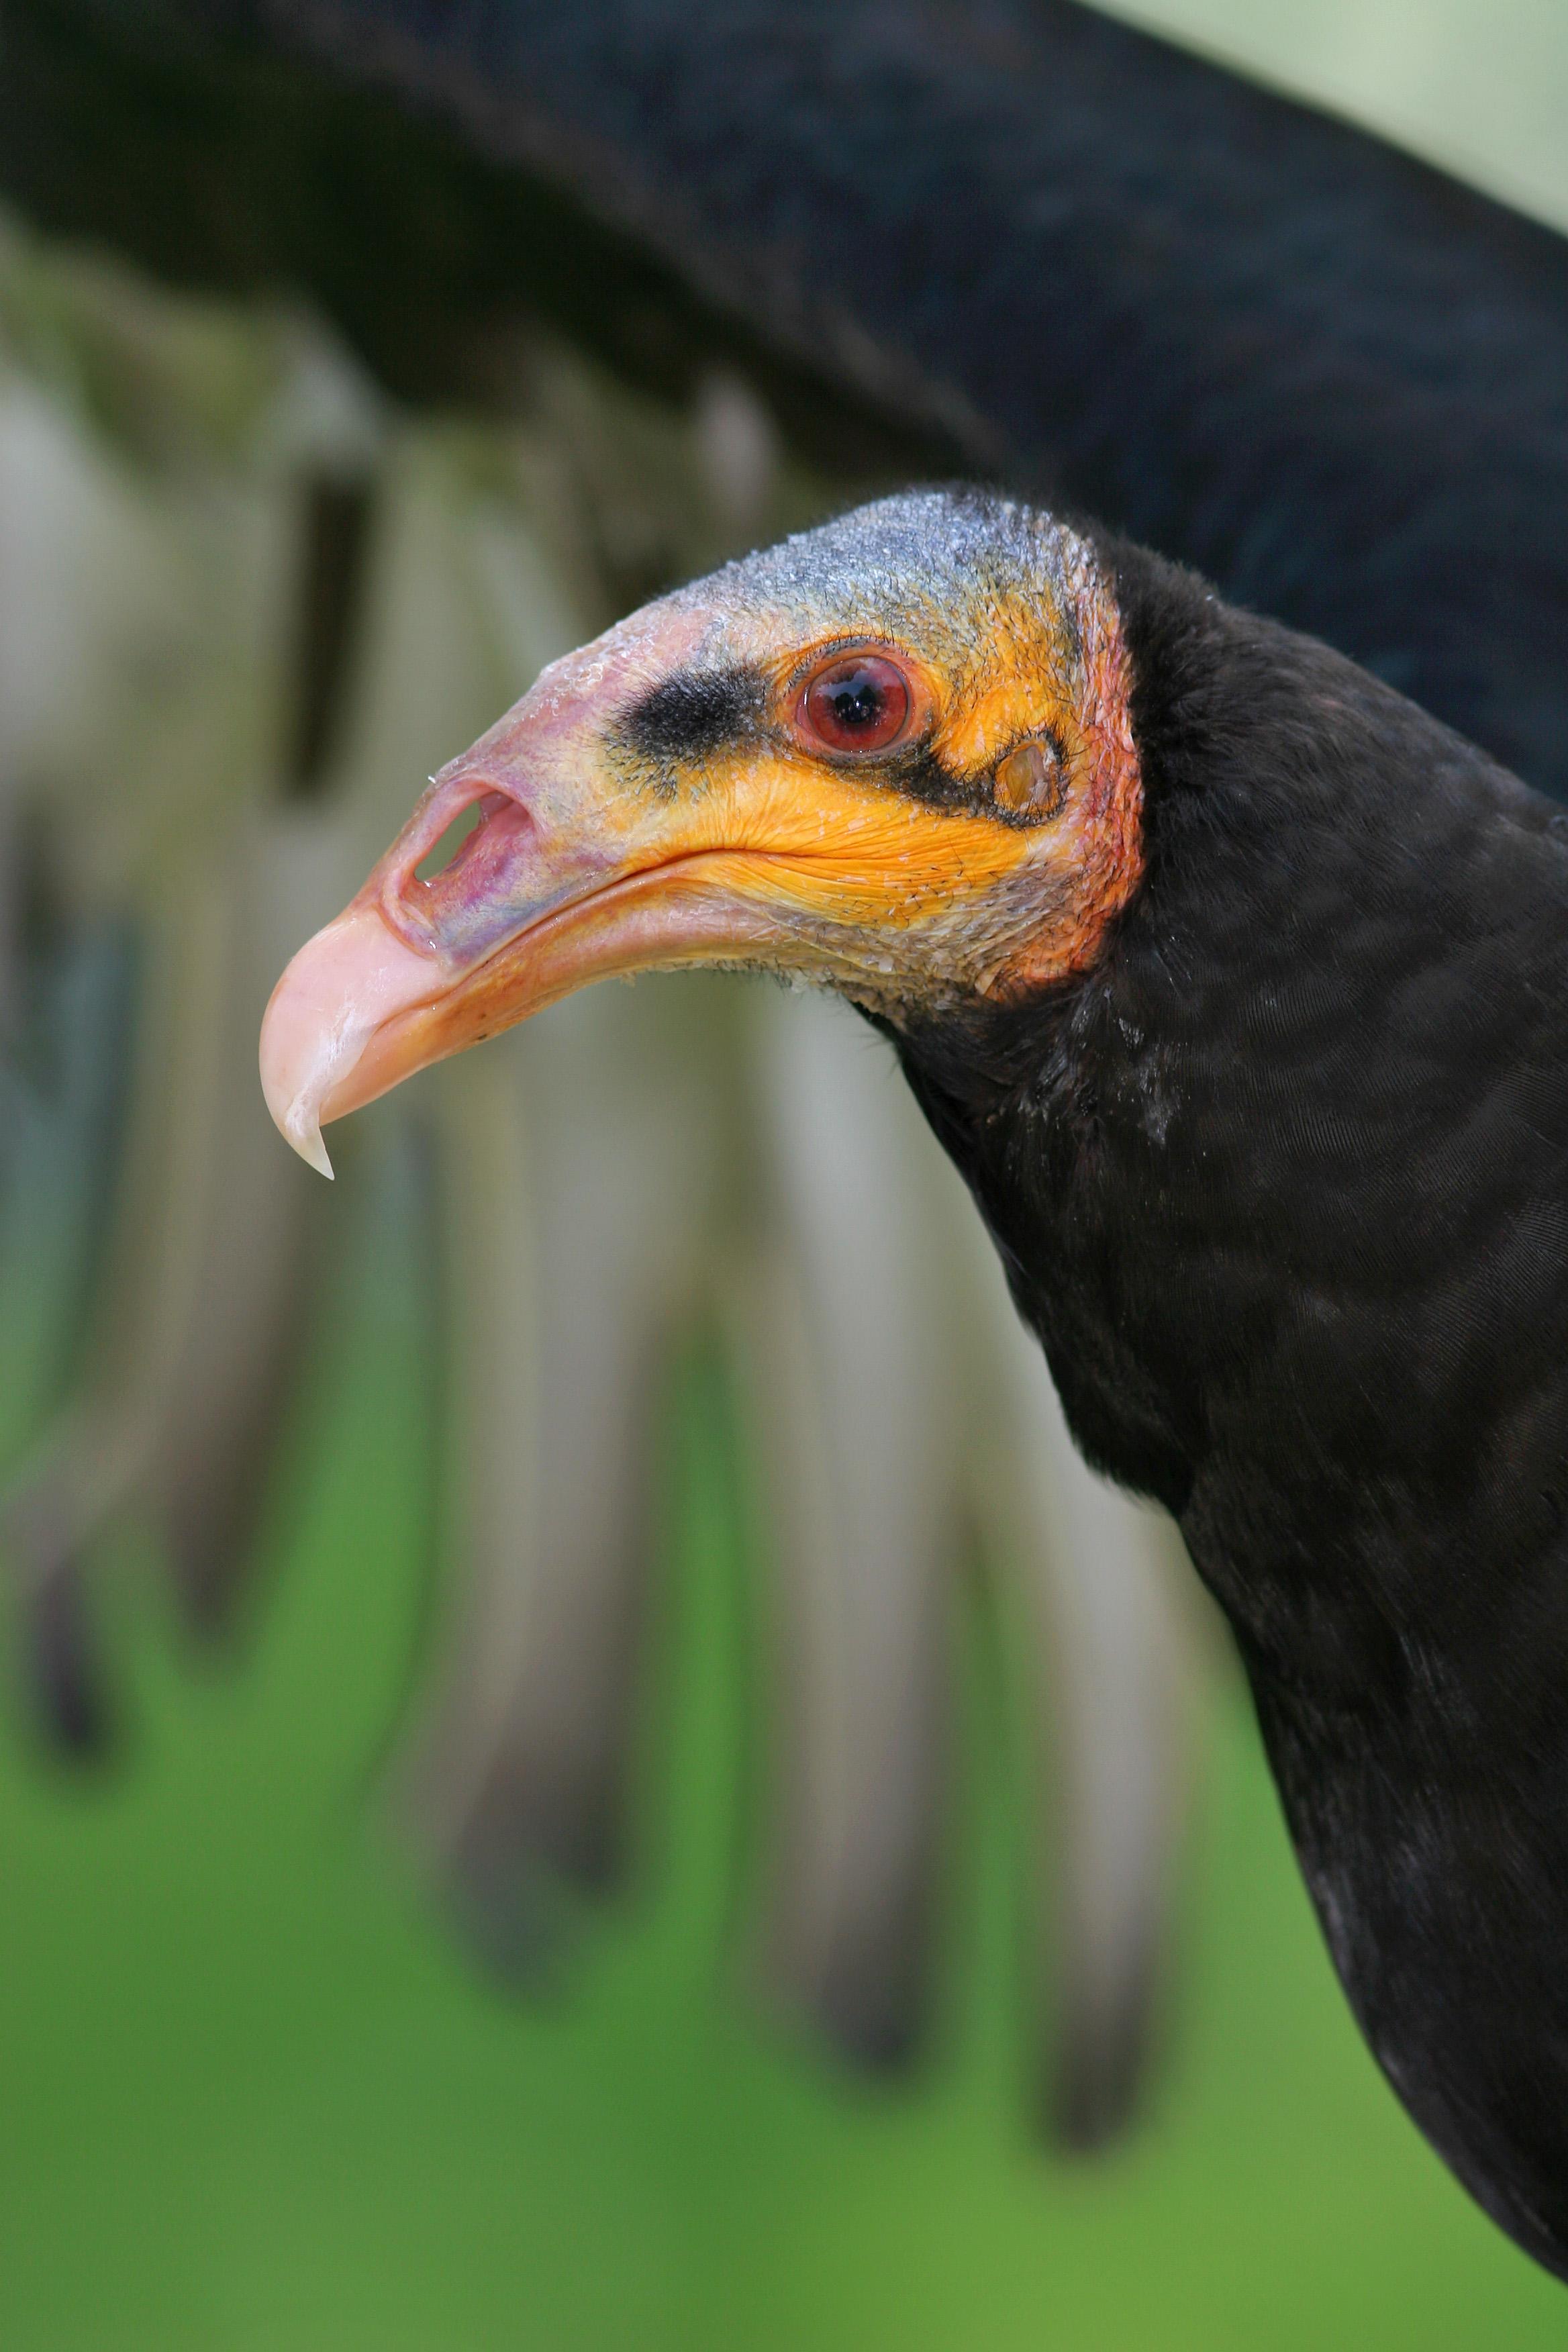 Lesser Yellow-headed Vulture at Amsterdam Zoo, Nethelands by Arjan Haverkamp